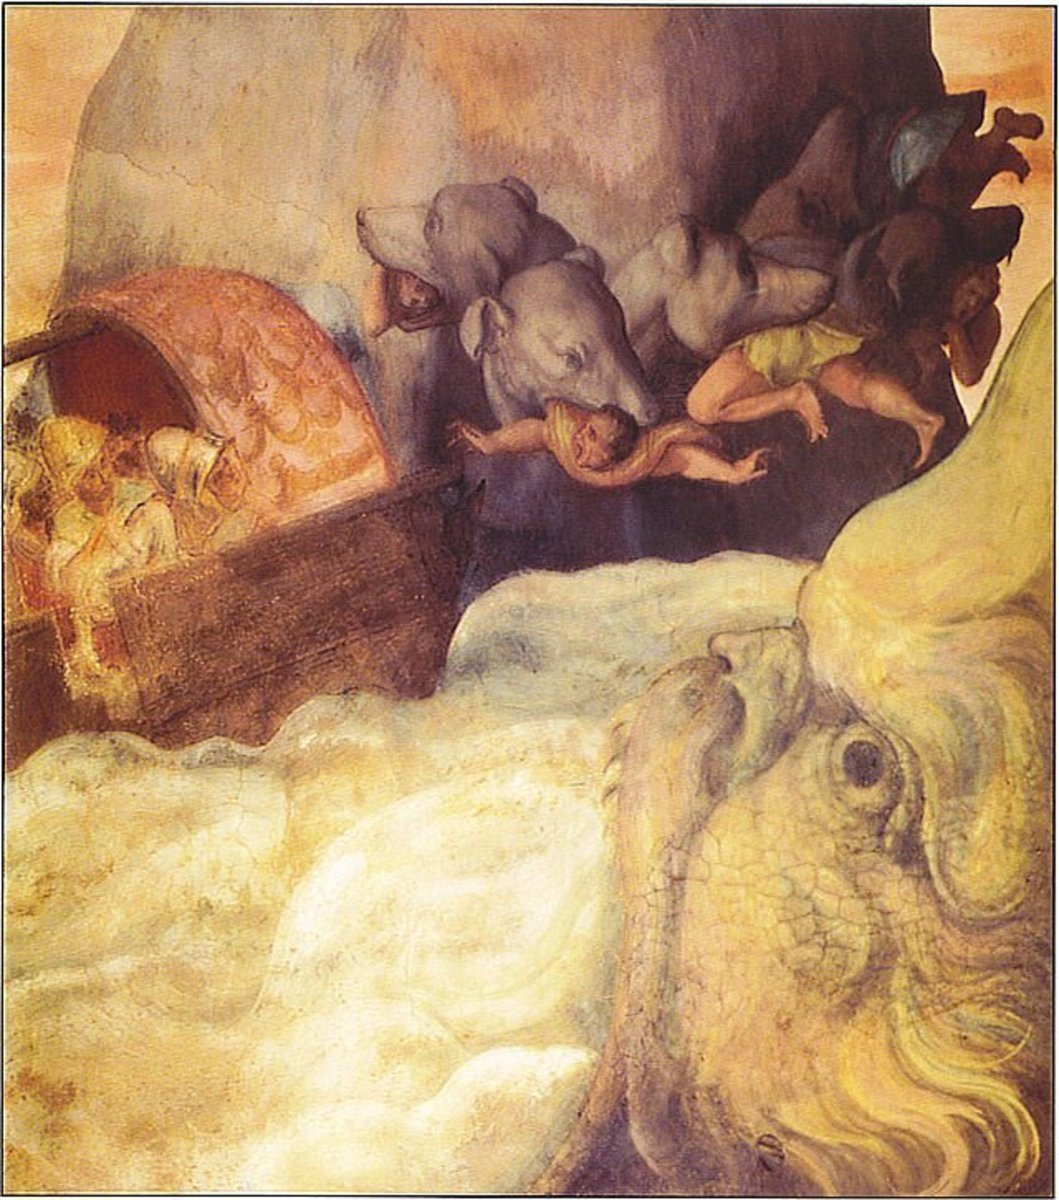 Scylla and Charybdis: Monsters of Greek mythology   Owlcation